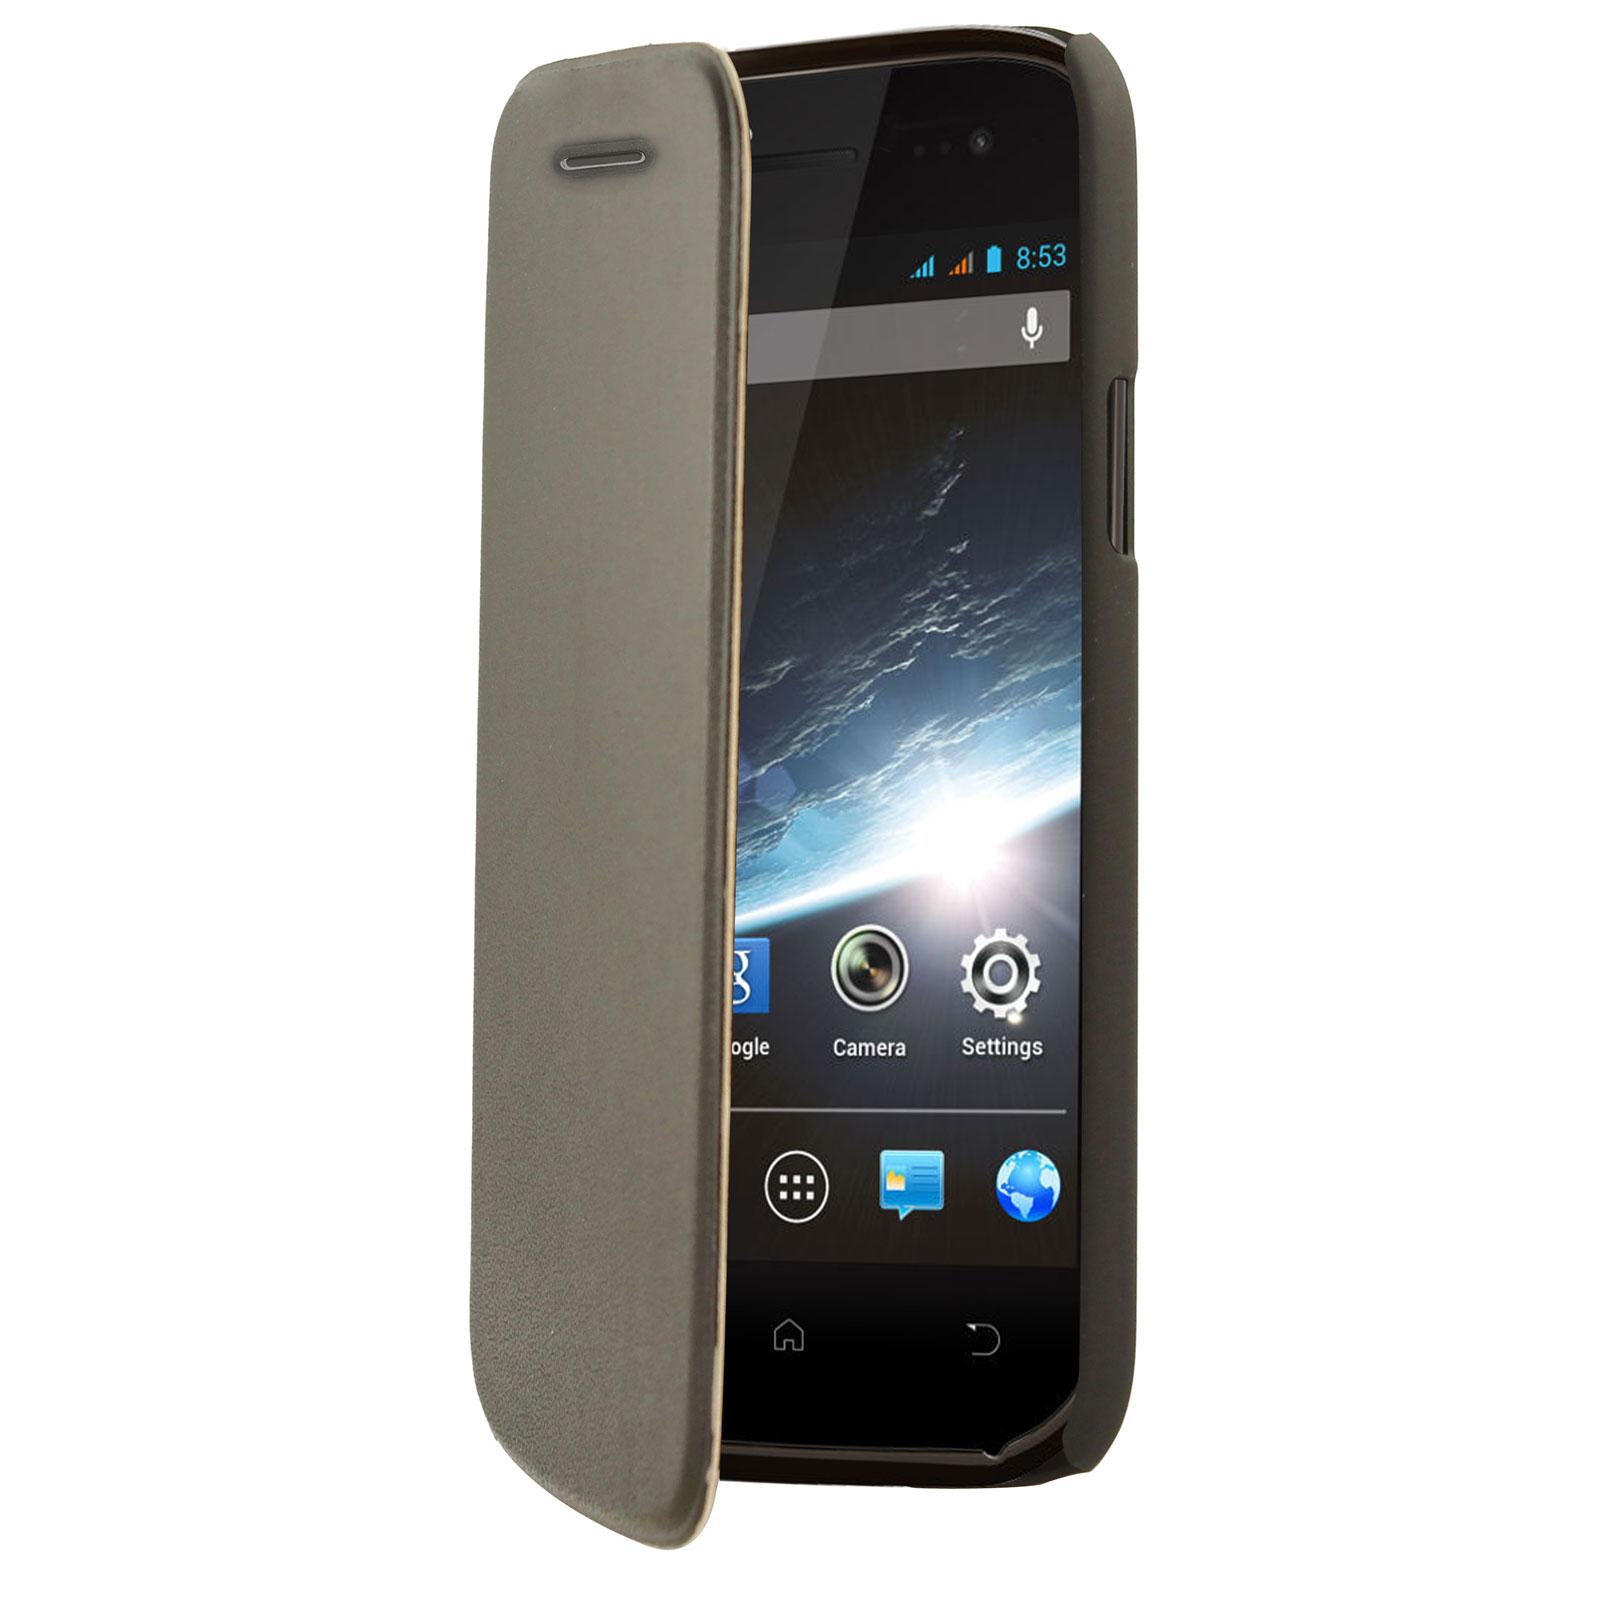 Etui téléphone Swiss Charger Etui Folio Slim Noir Wiko Cink Slim 2 Etui de protection pour Wiko Cink Slim 2